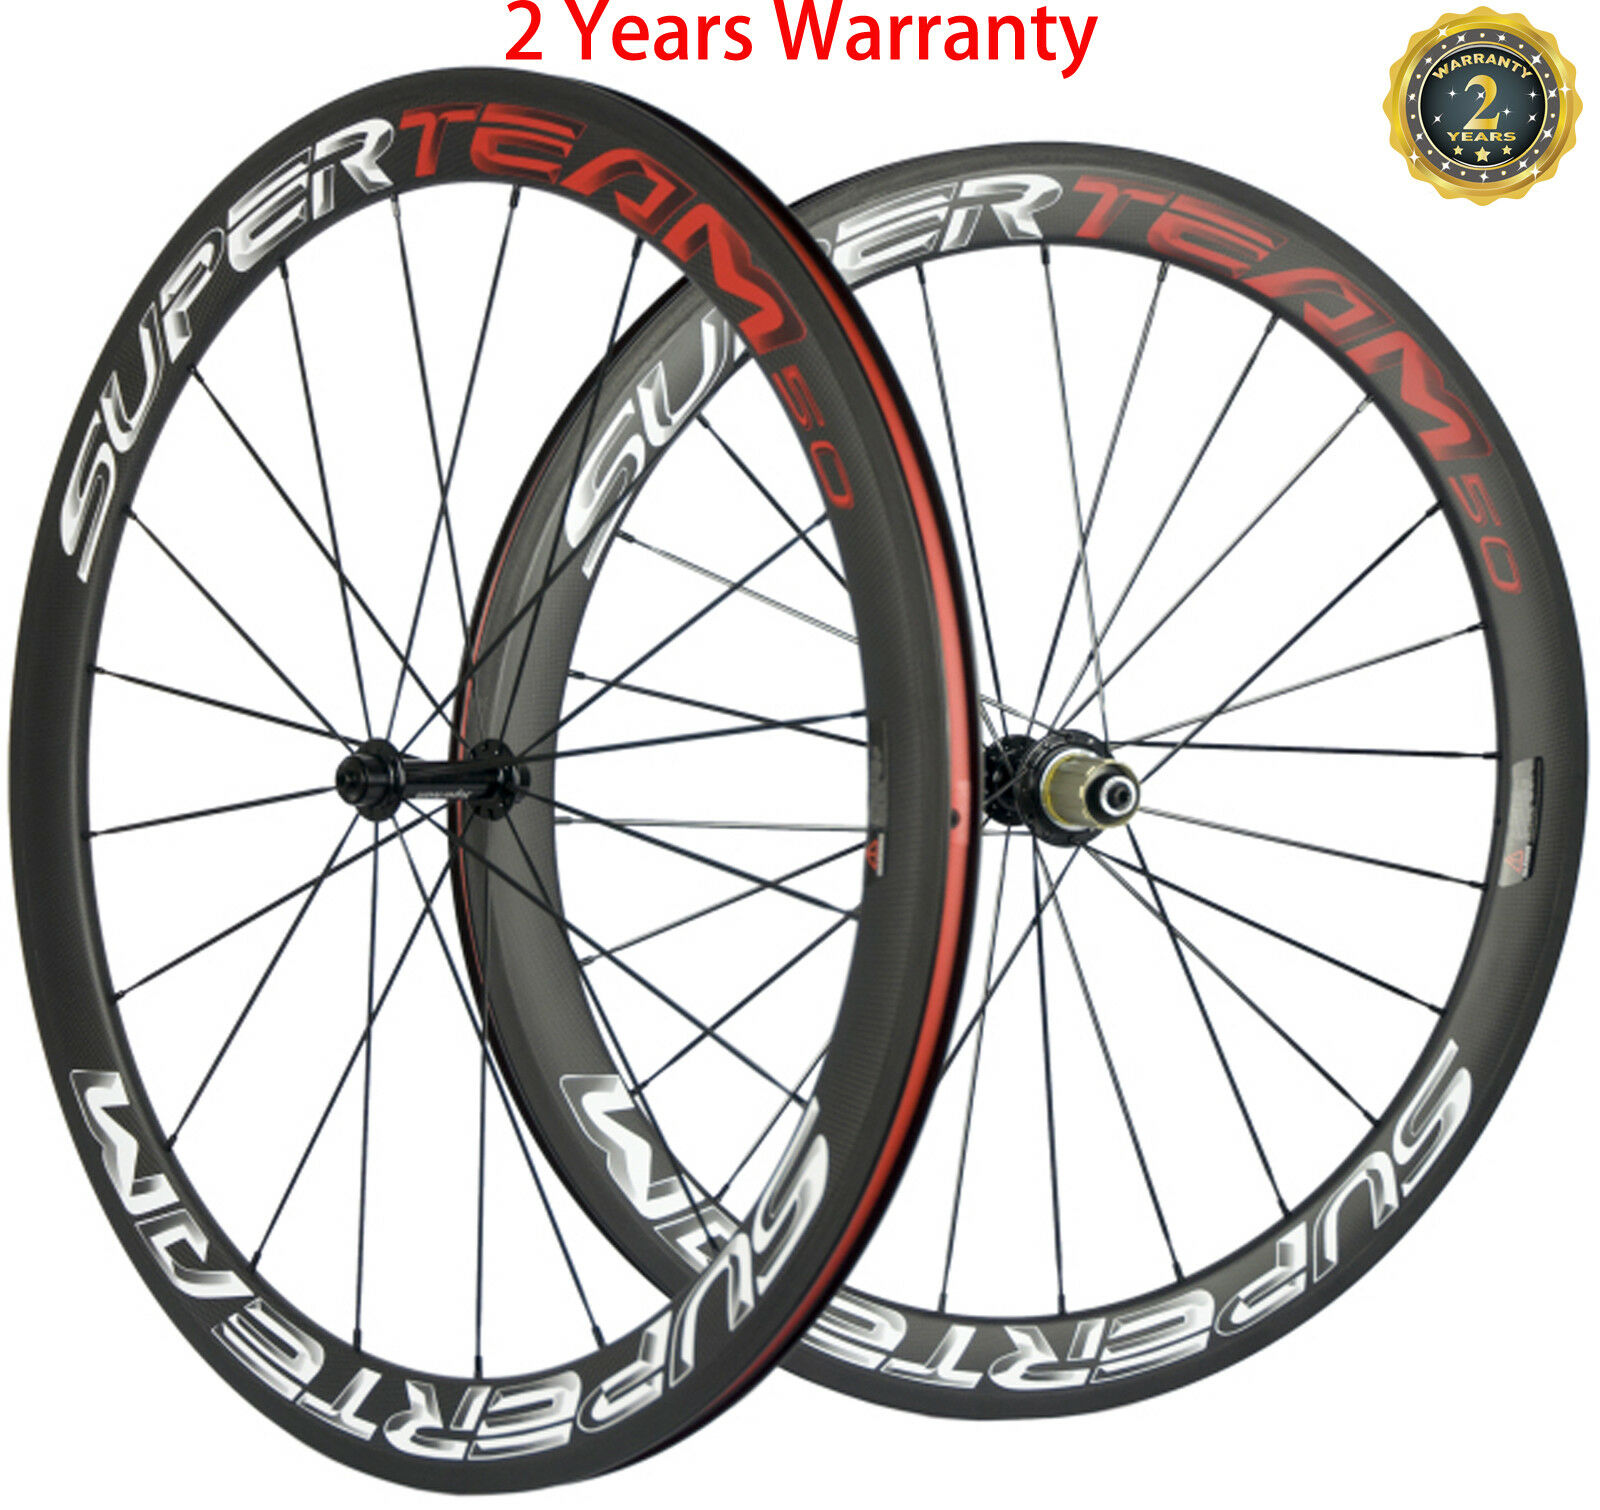 Carbon Wheels  Bicycle Road Bike Bicycle 700C Wheelset Clincher Cycle Race Matte  big savings